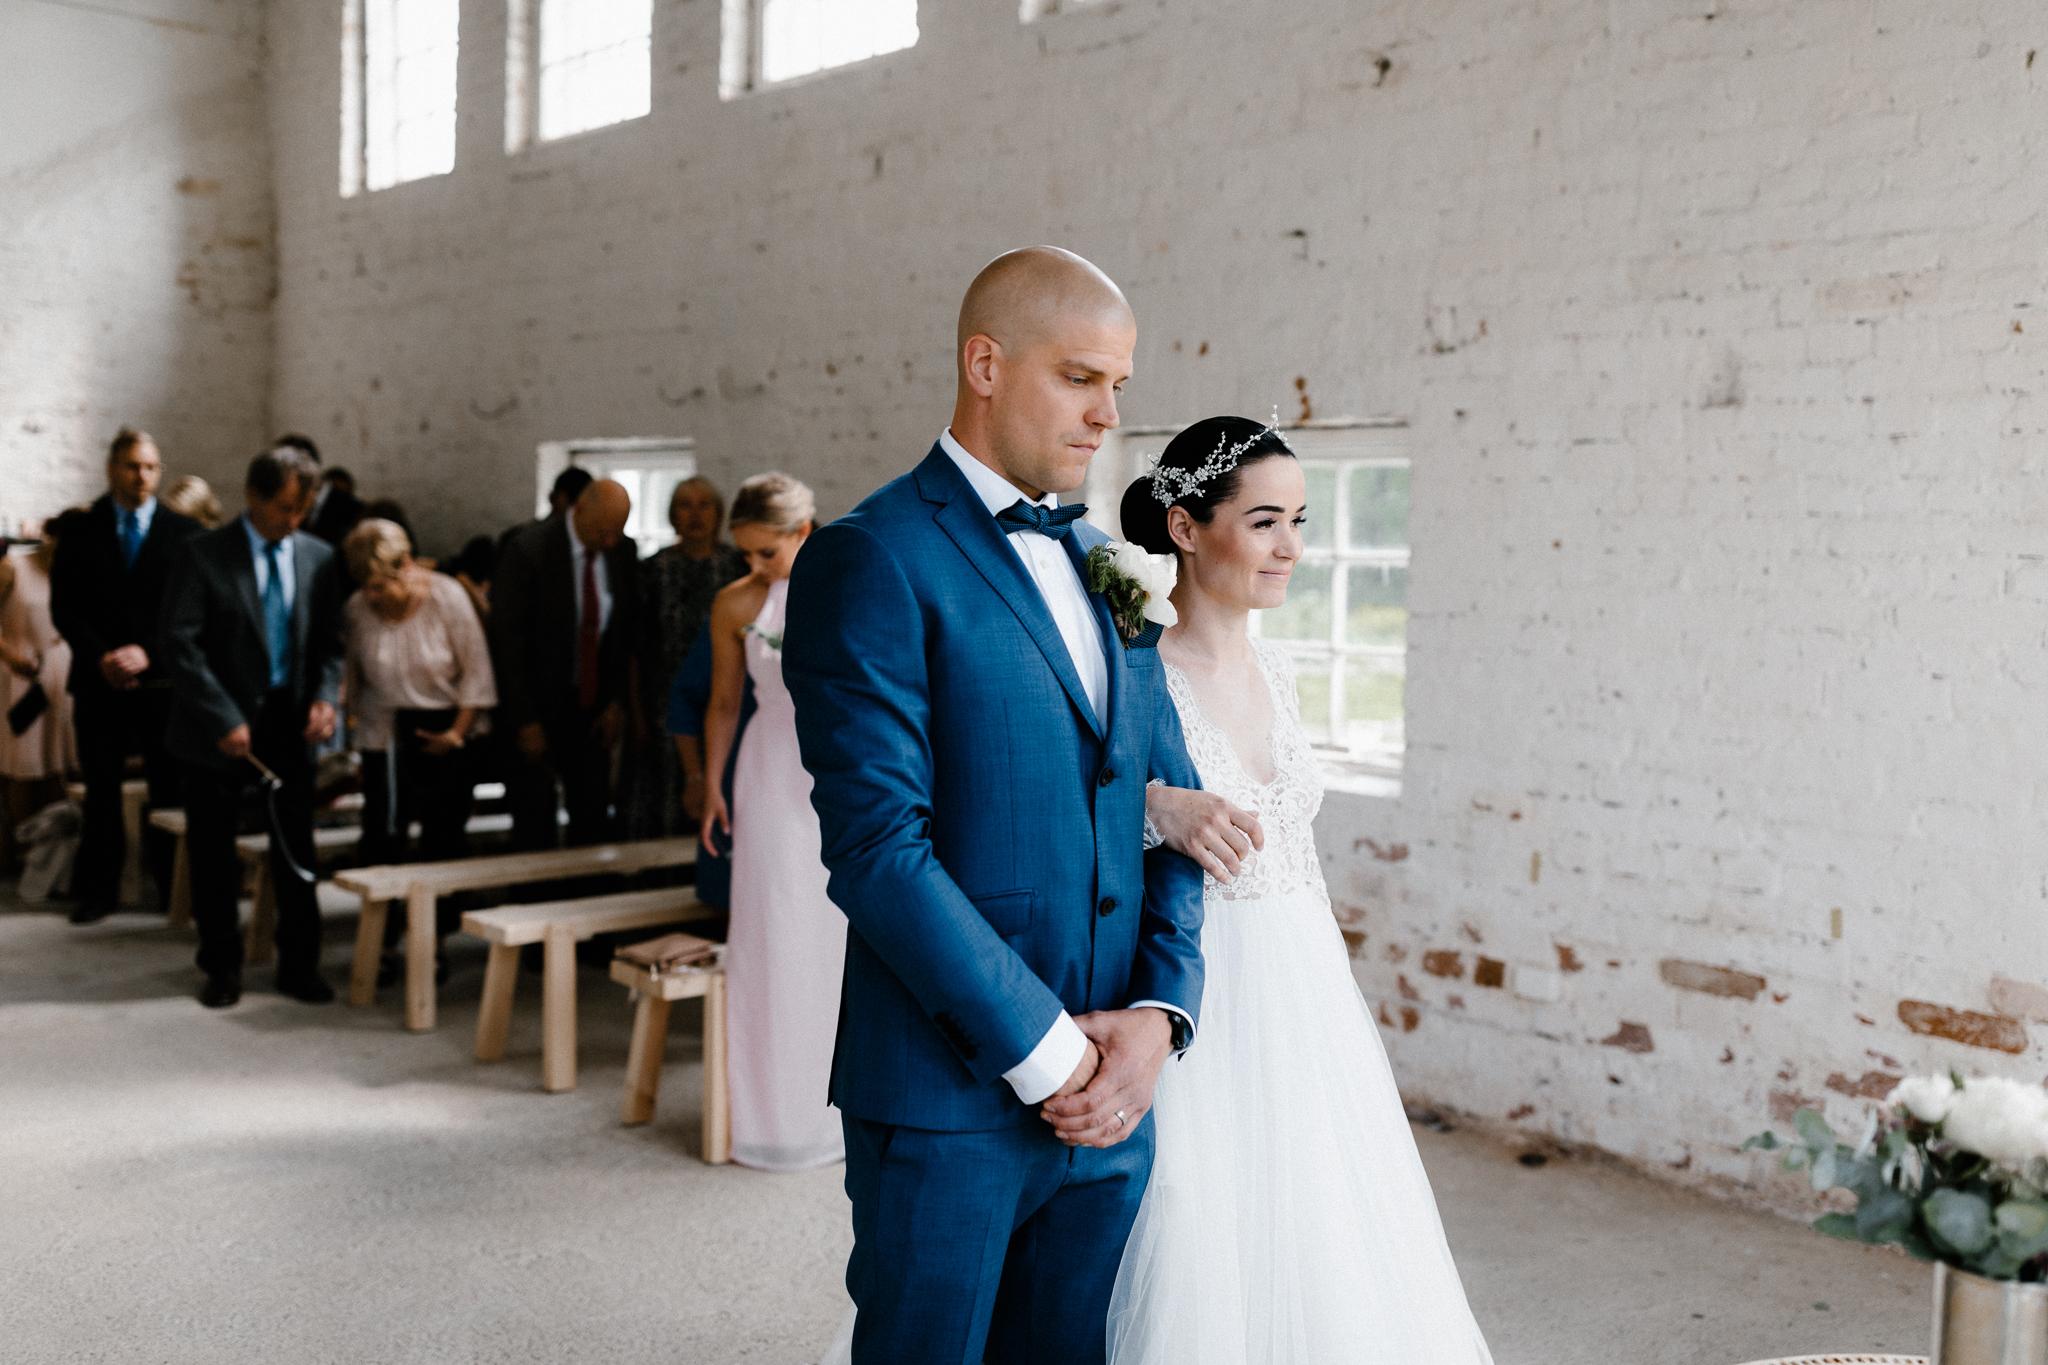 Essi + Ville   Oitbacka Gården   by Patrick Karkkolainen Wedding Photography-151.jpg